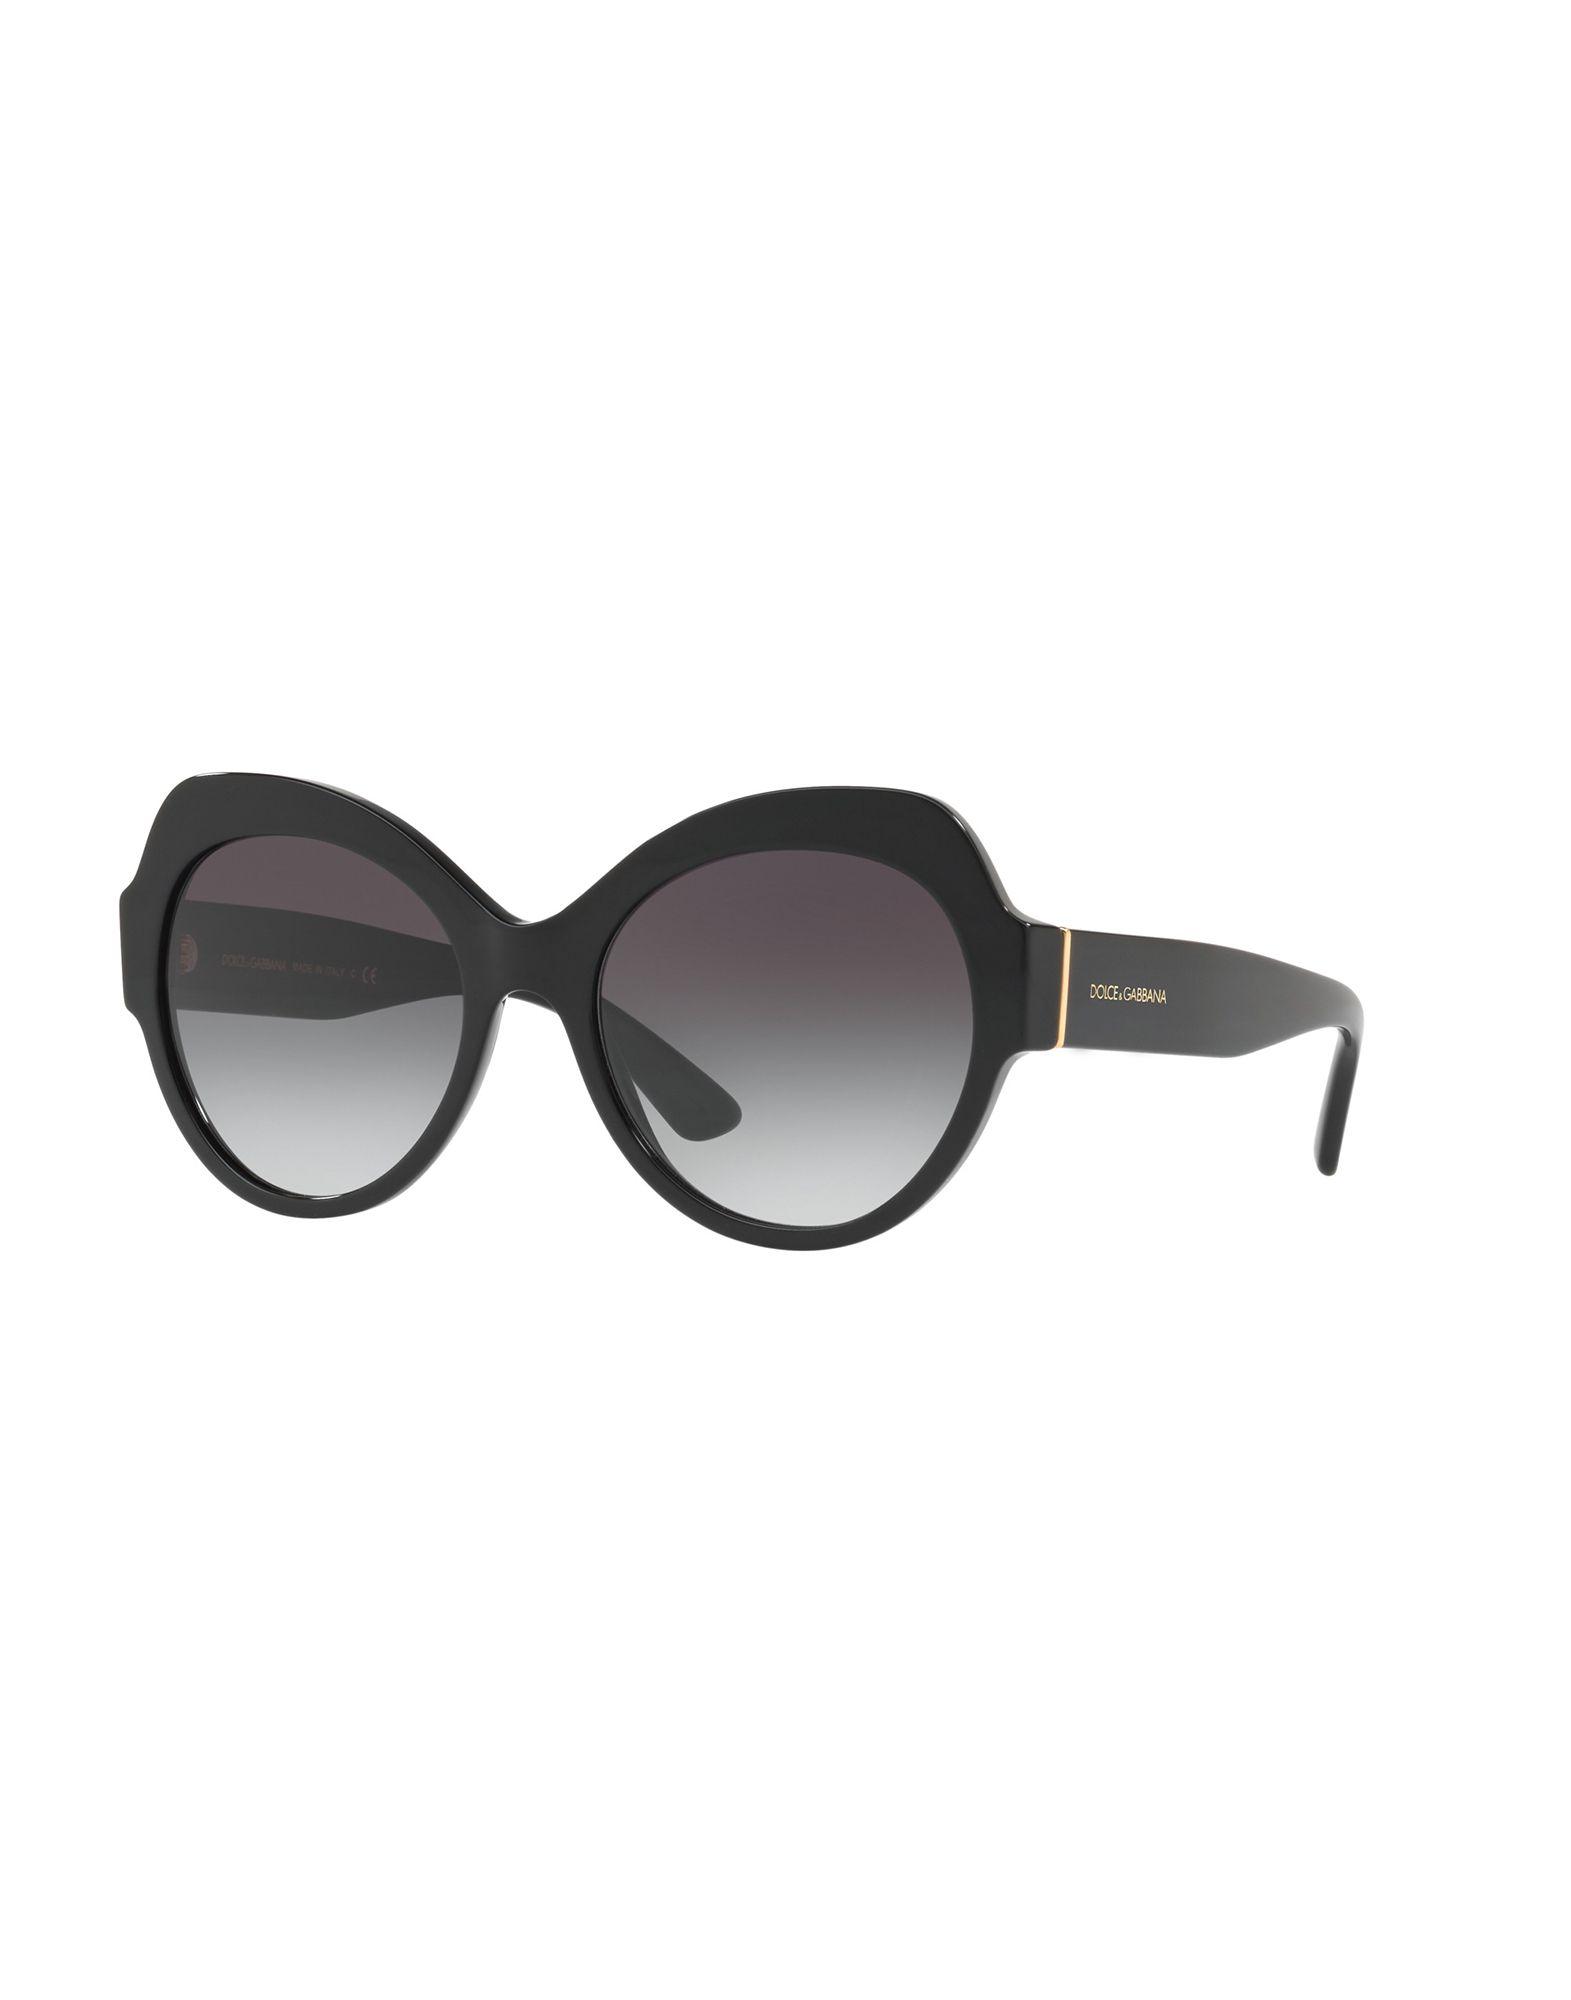 Occhiali Da Sole Dolce & Gabbana Dg4320 - Donna - Acquista online su